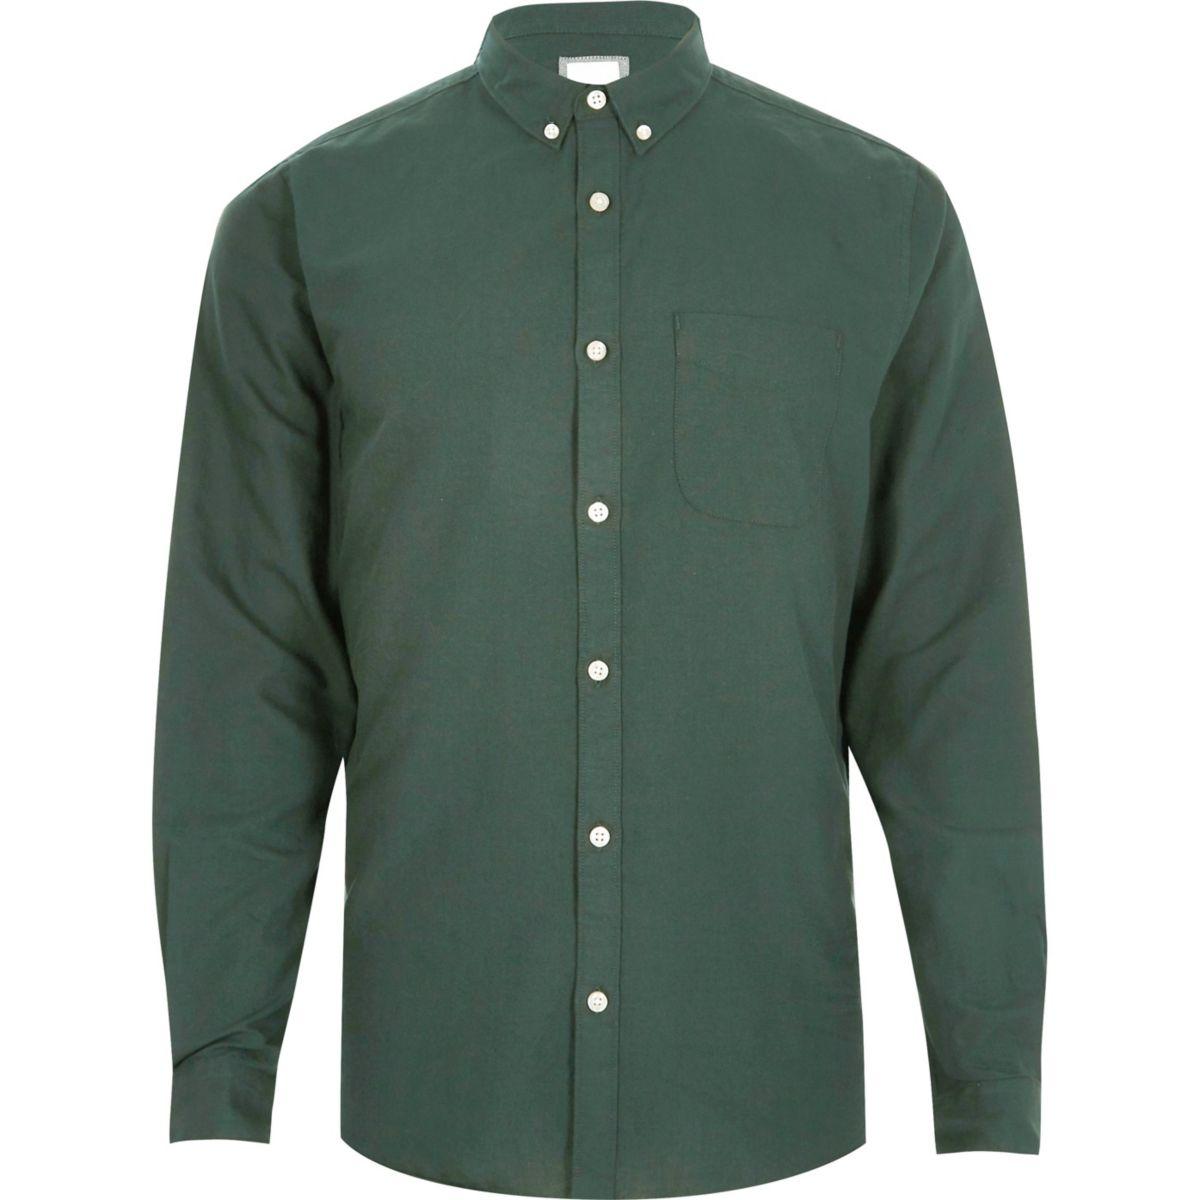 Big and Tall green button-down Oxford shirt